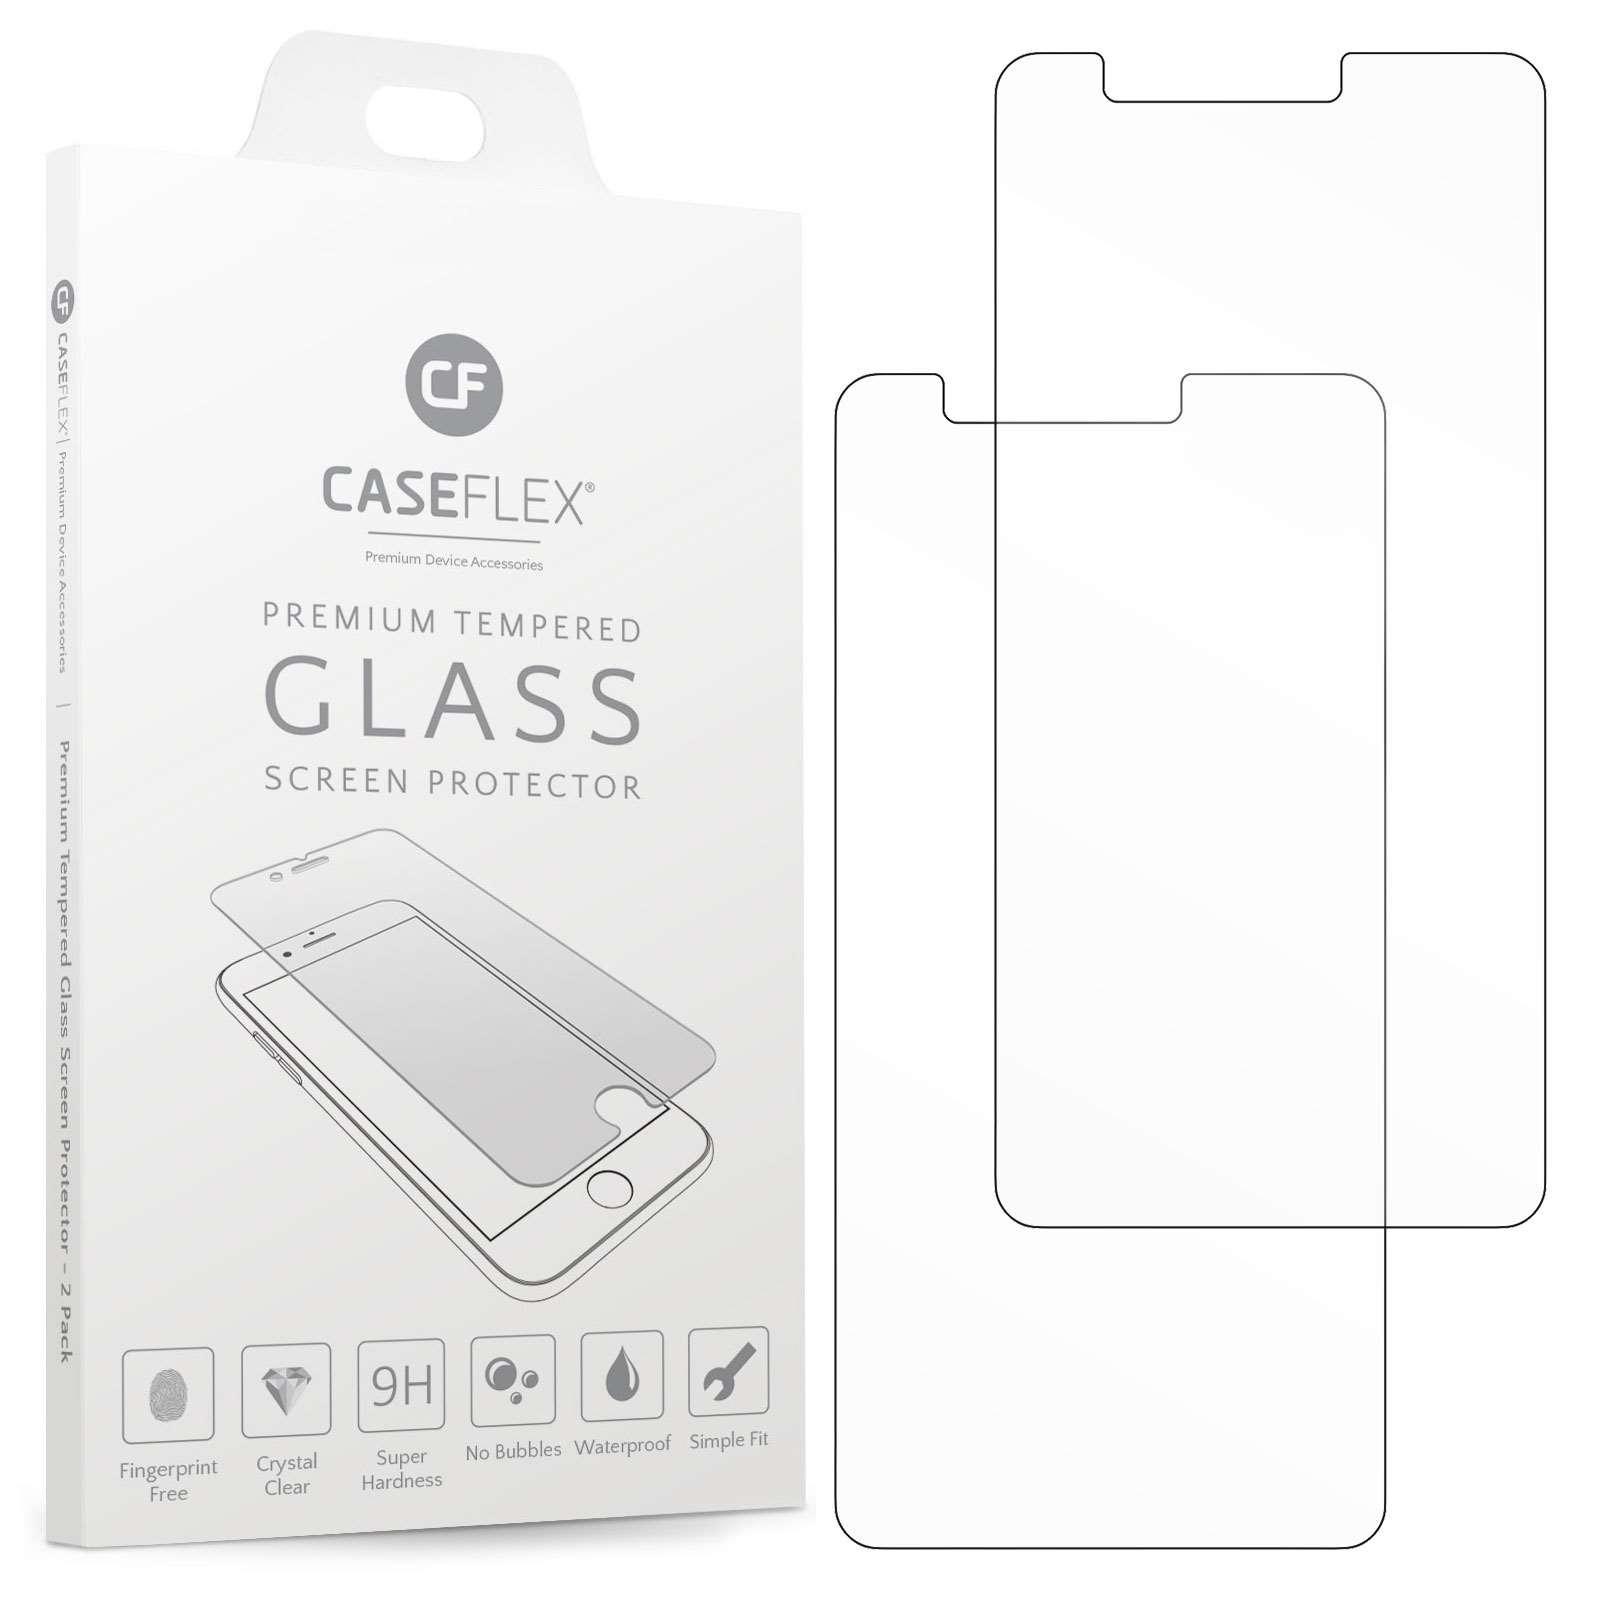 Caseflex Tempered Glass - Αντιχαρακτικό Γυαλί Οθόνης LG K9 / K8 2018 - 2 Τεμάχια (GL000003LG)